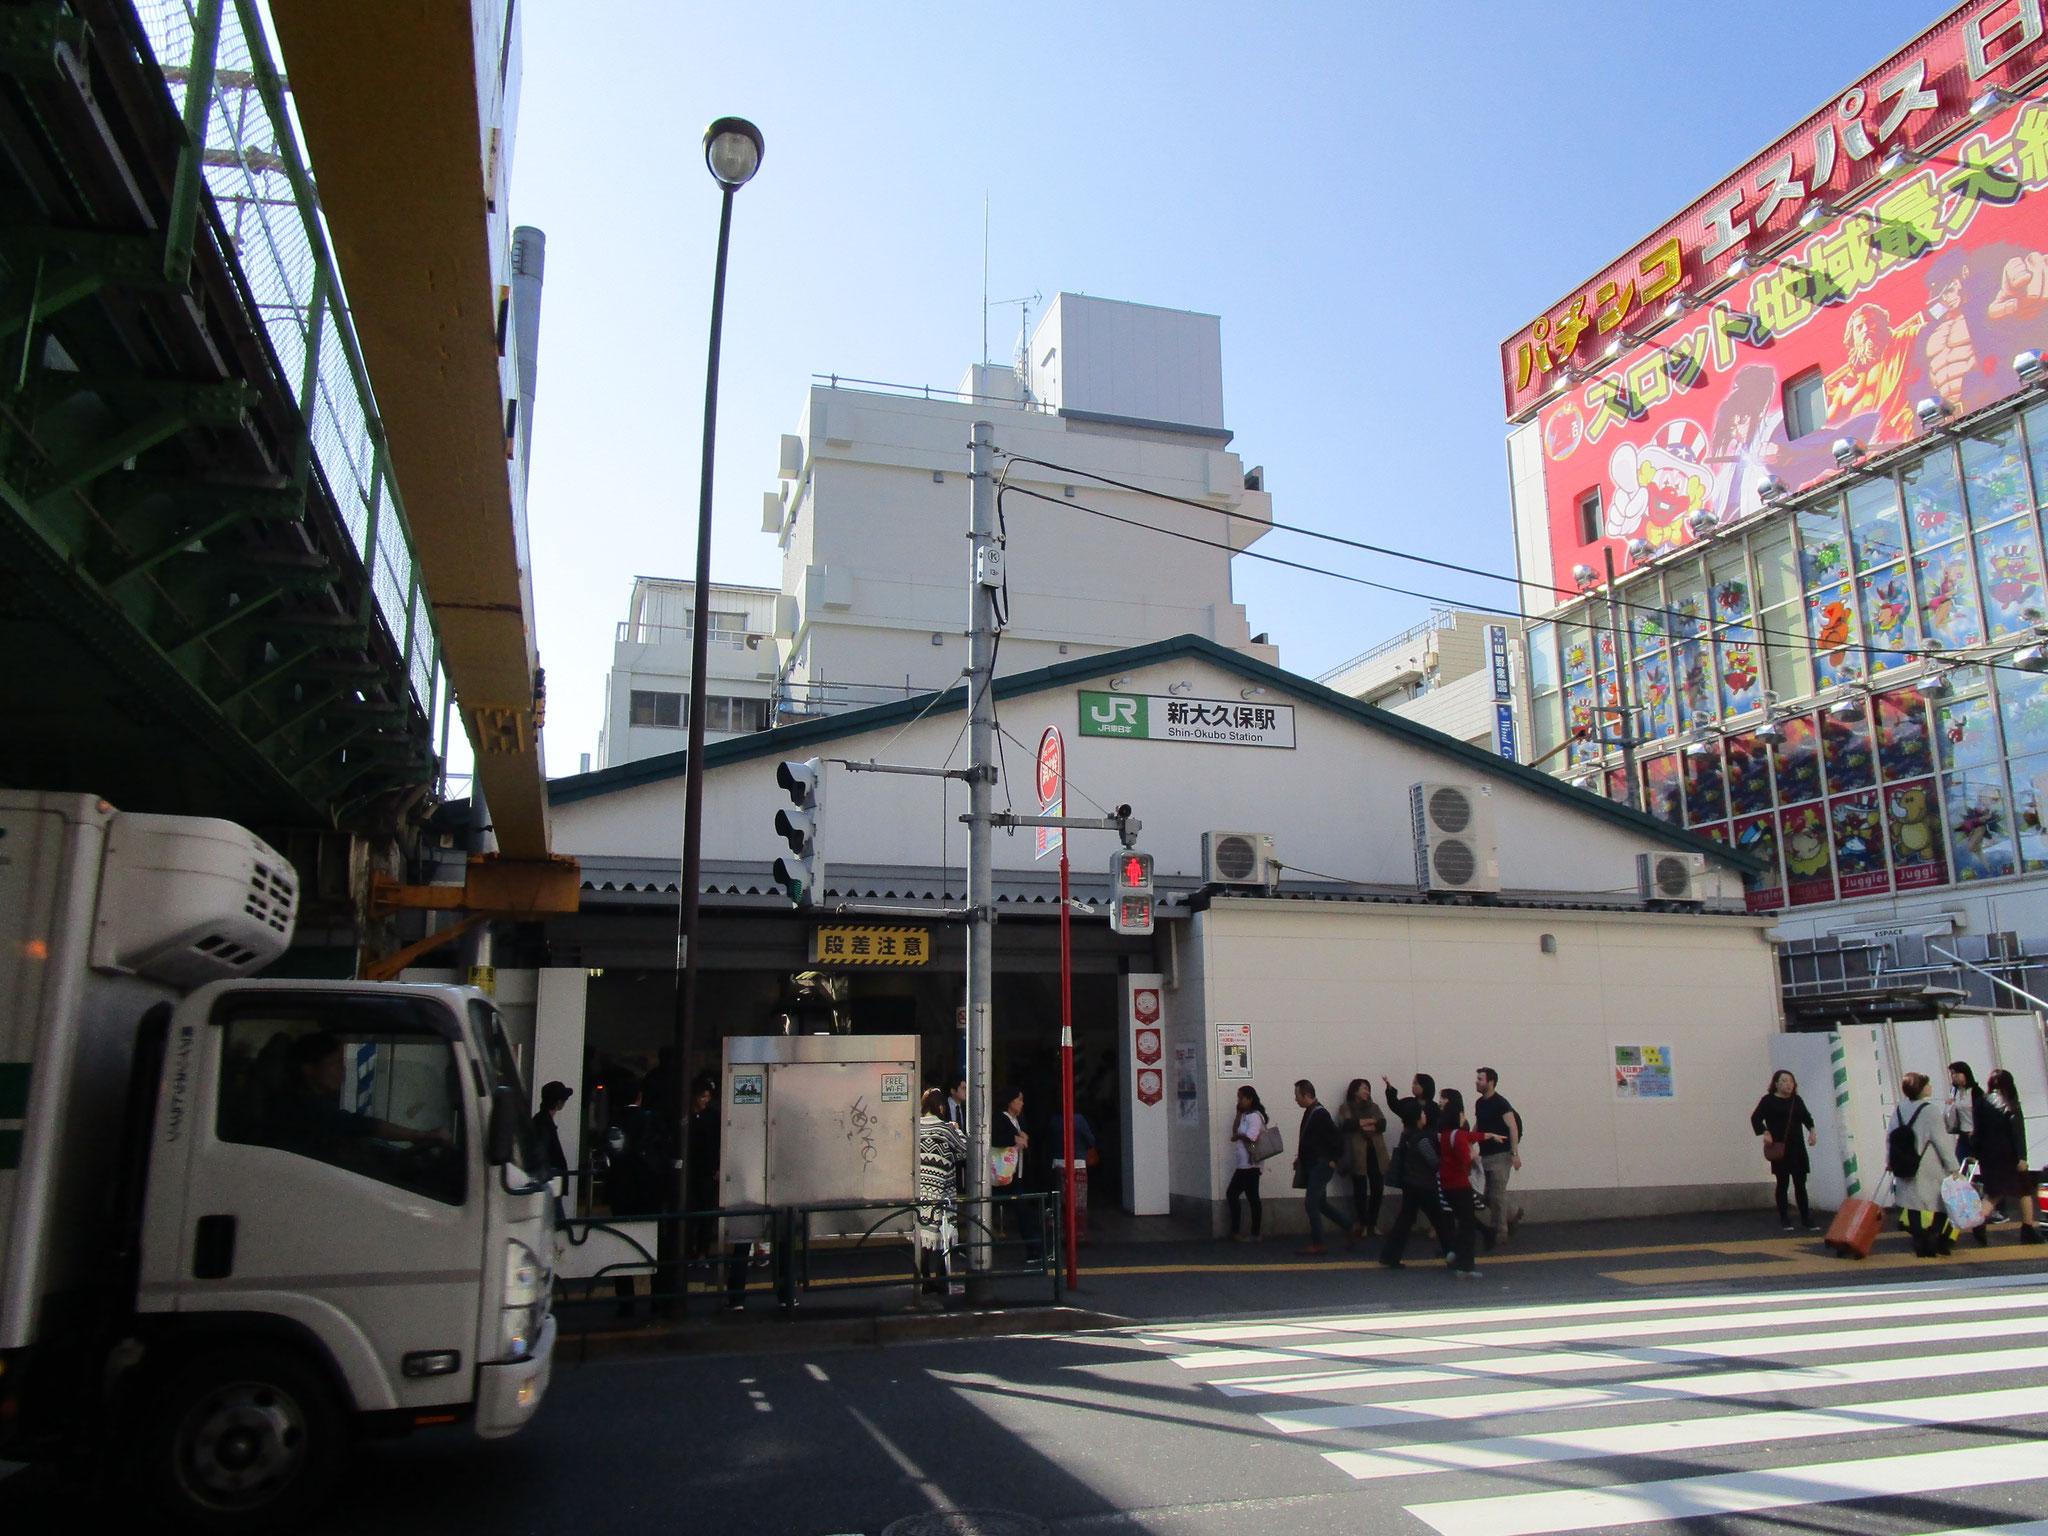 JR山手線「新大久保」駅前。休日には待ち合わせの人で溢れています